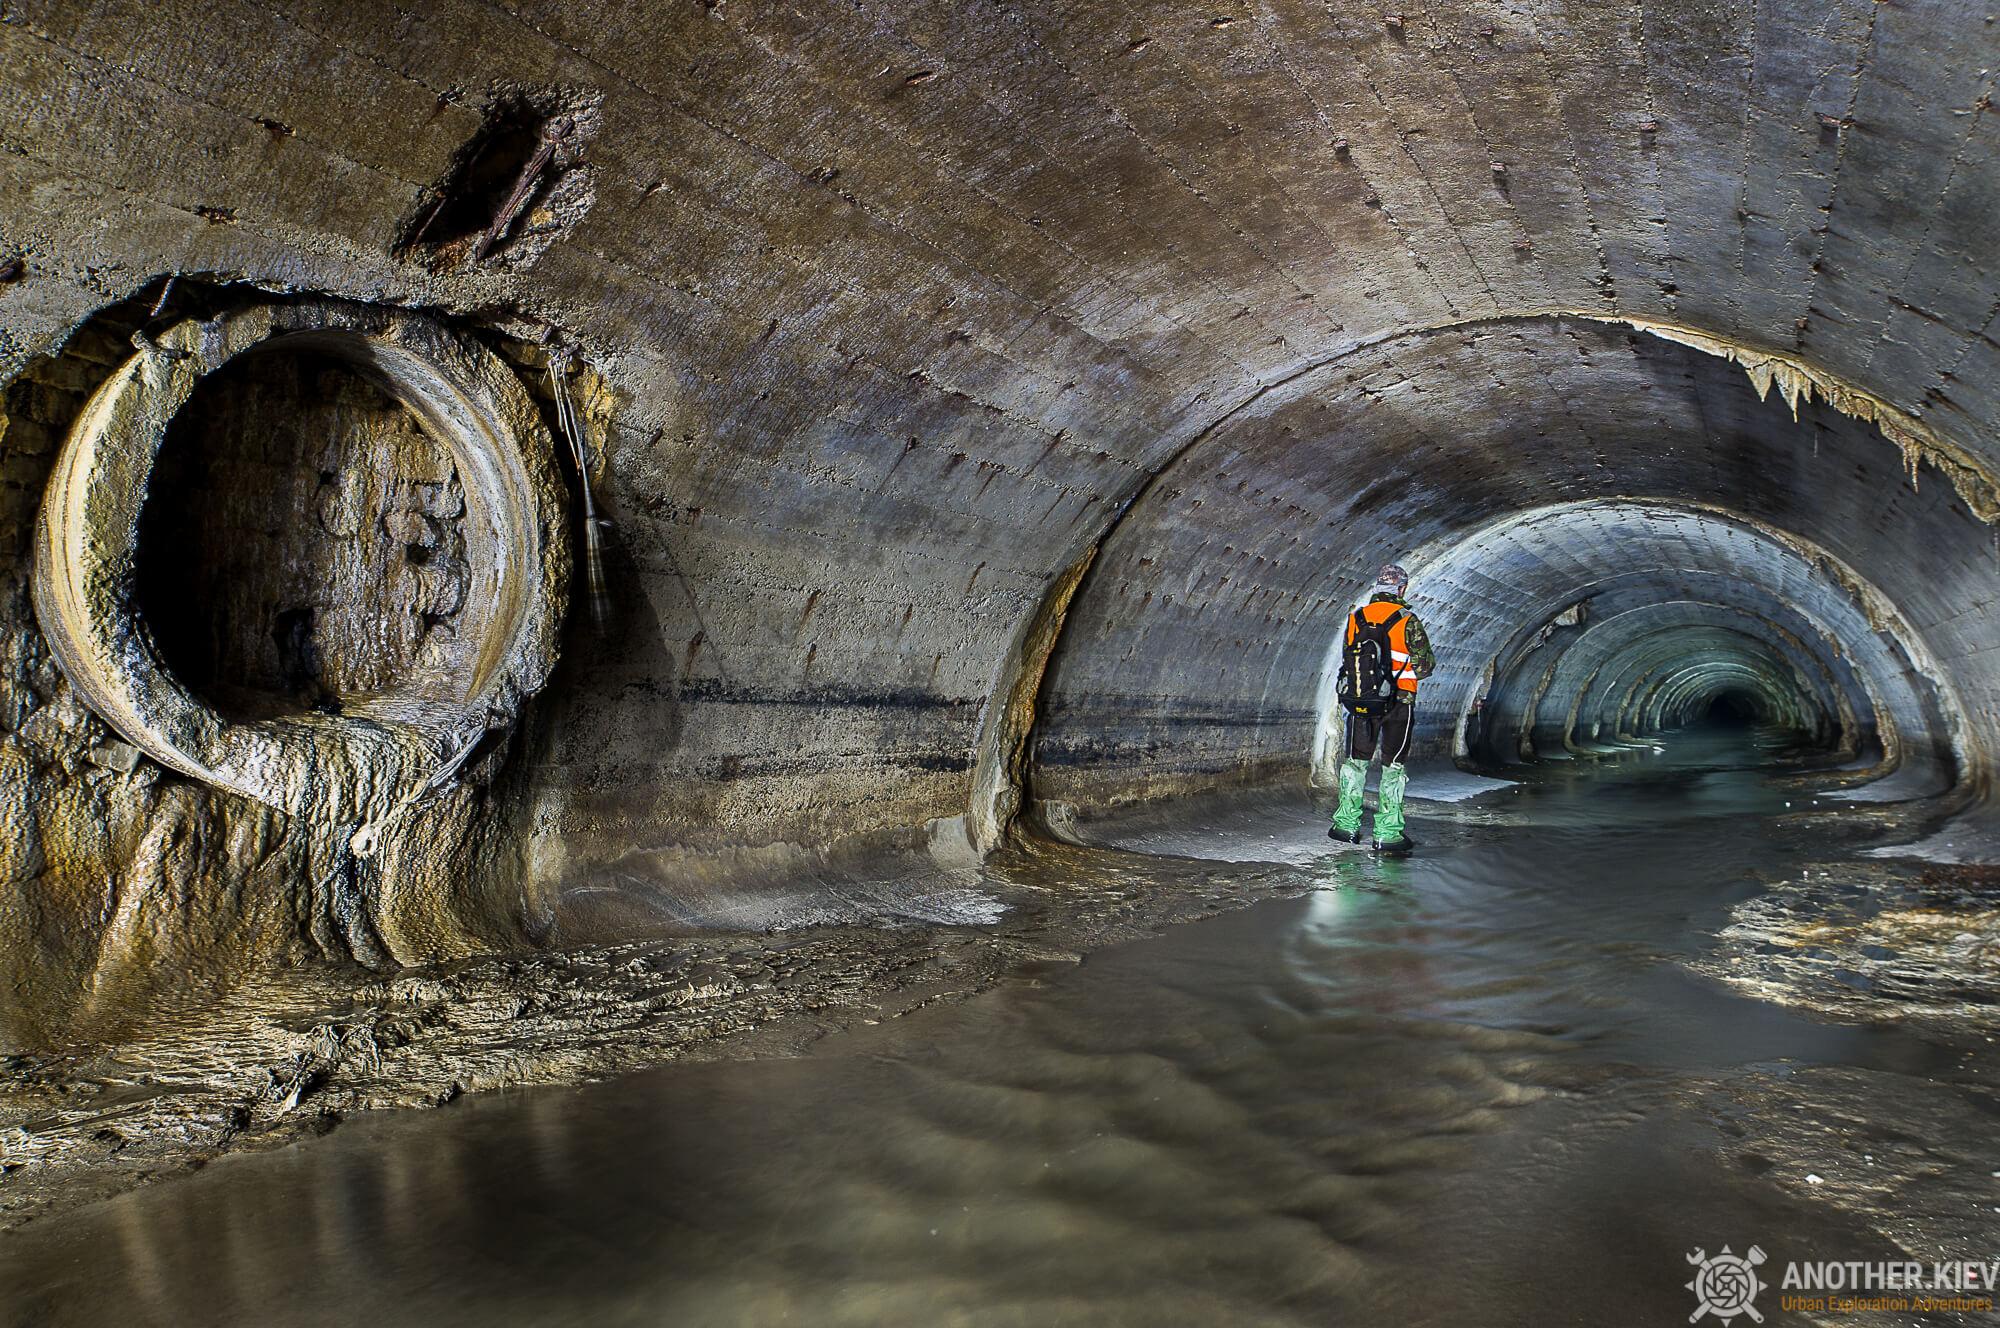 klov__IGP7923 Underground River Klov